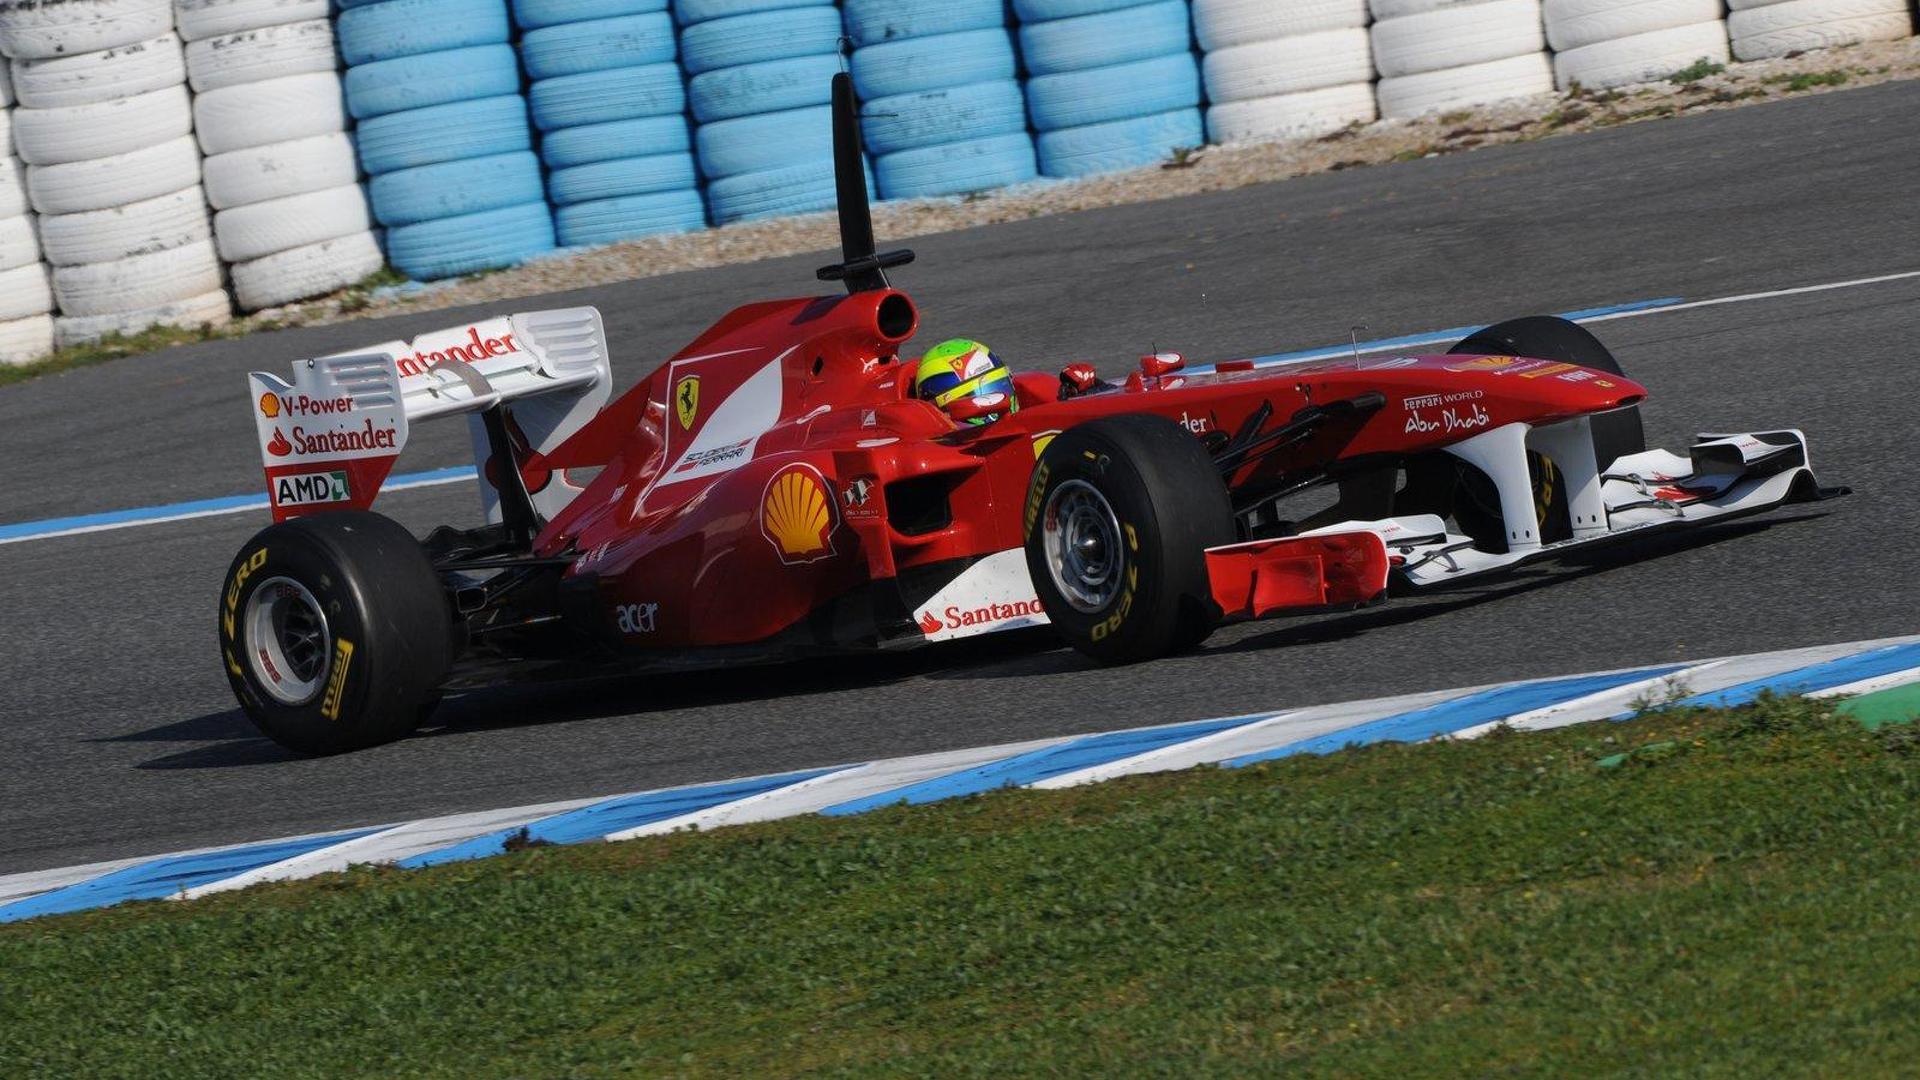 Ford Sues Ferrari Over F150 Name